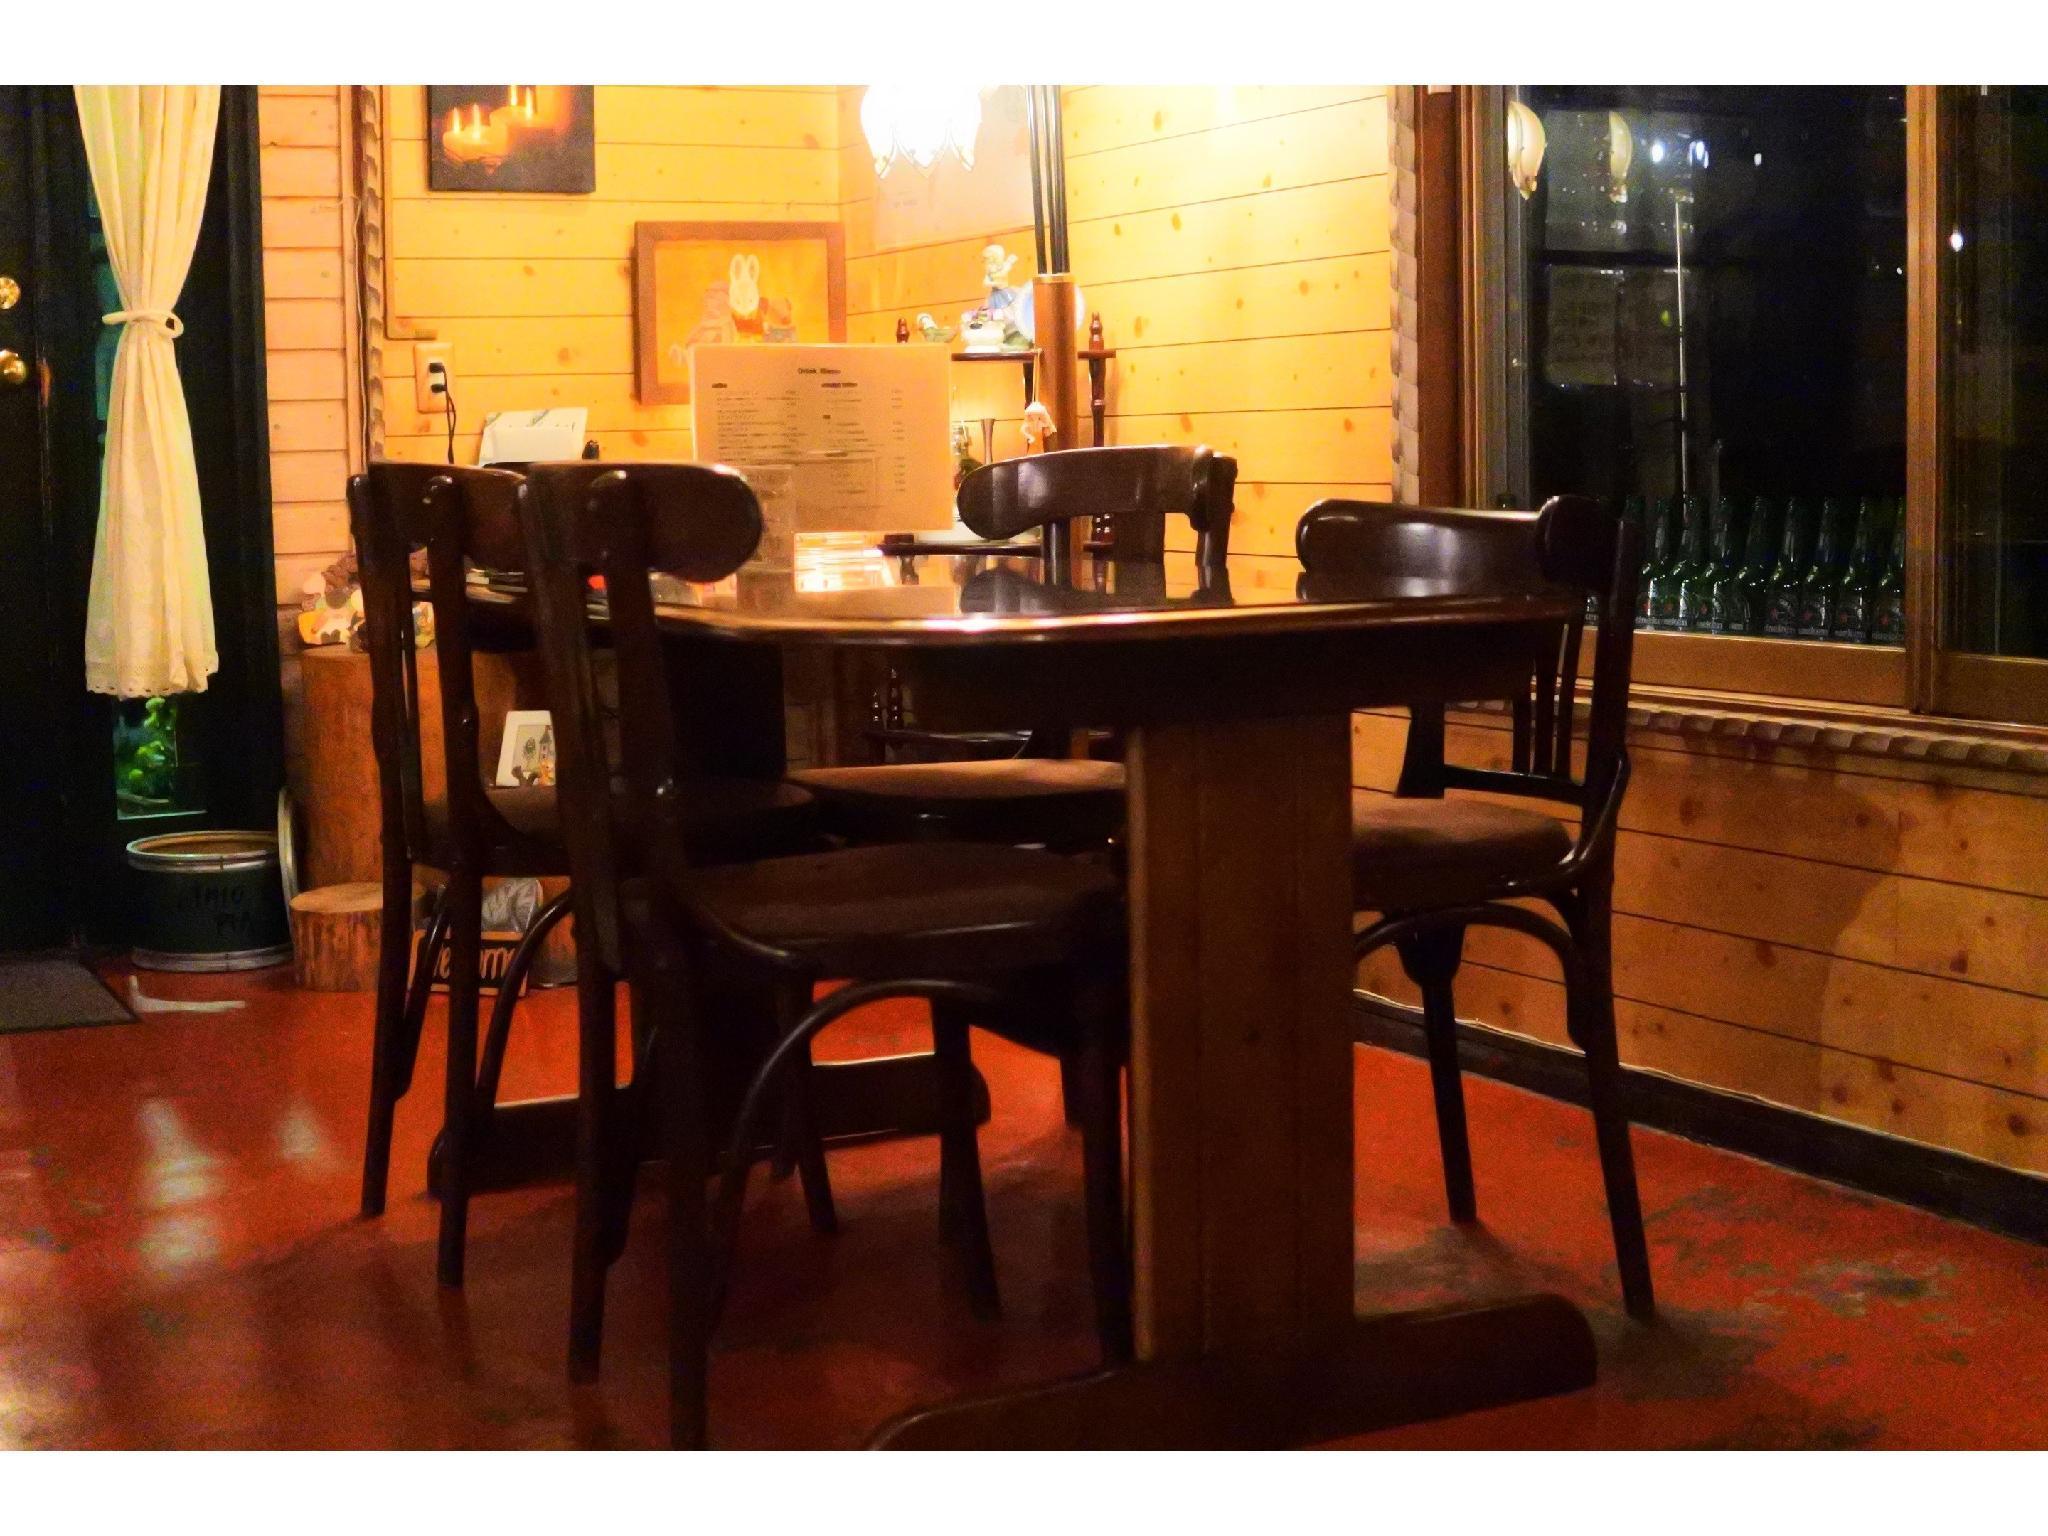 Cafe And Rest RetroBoy Coffee